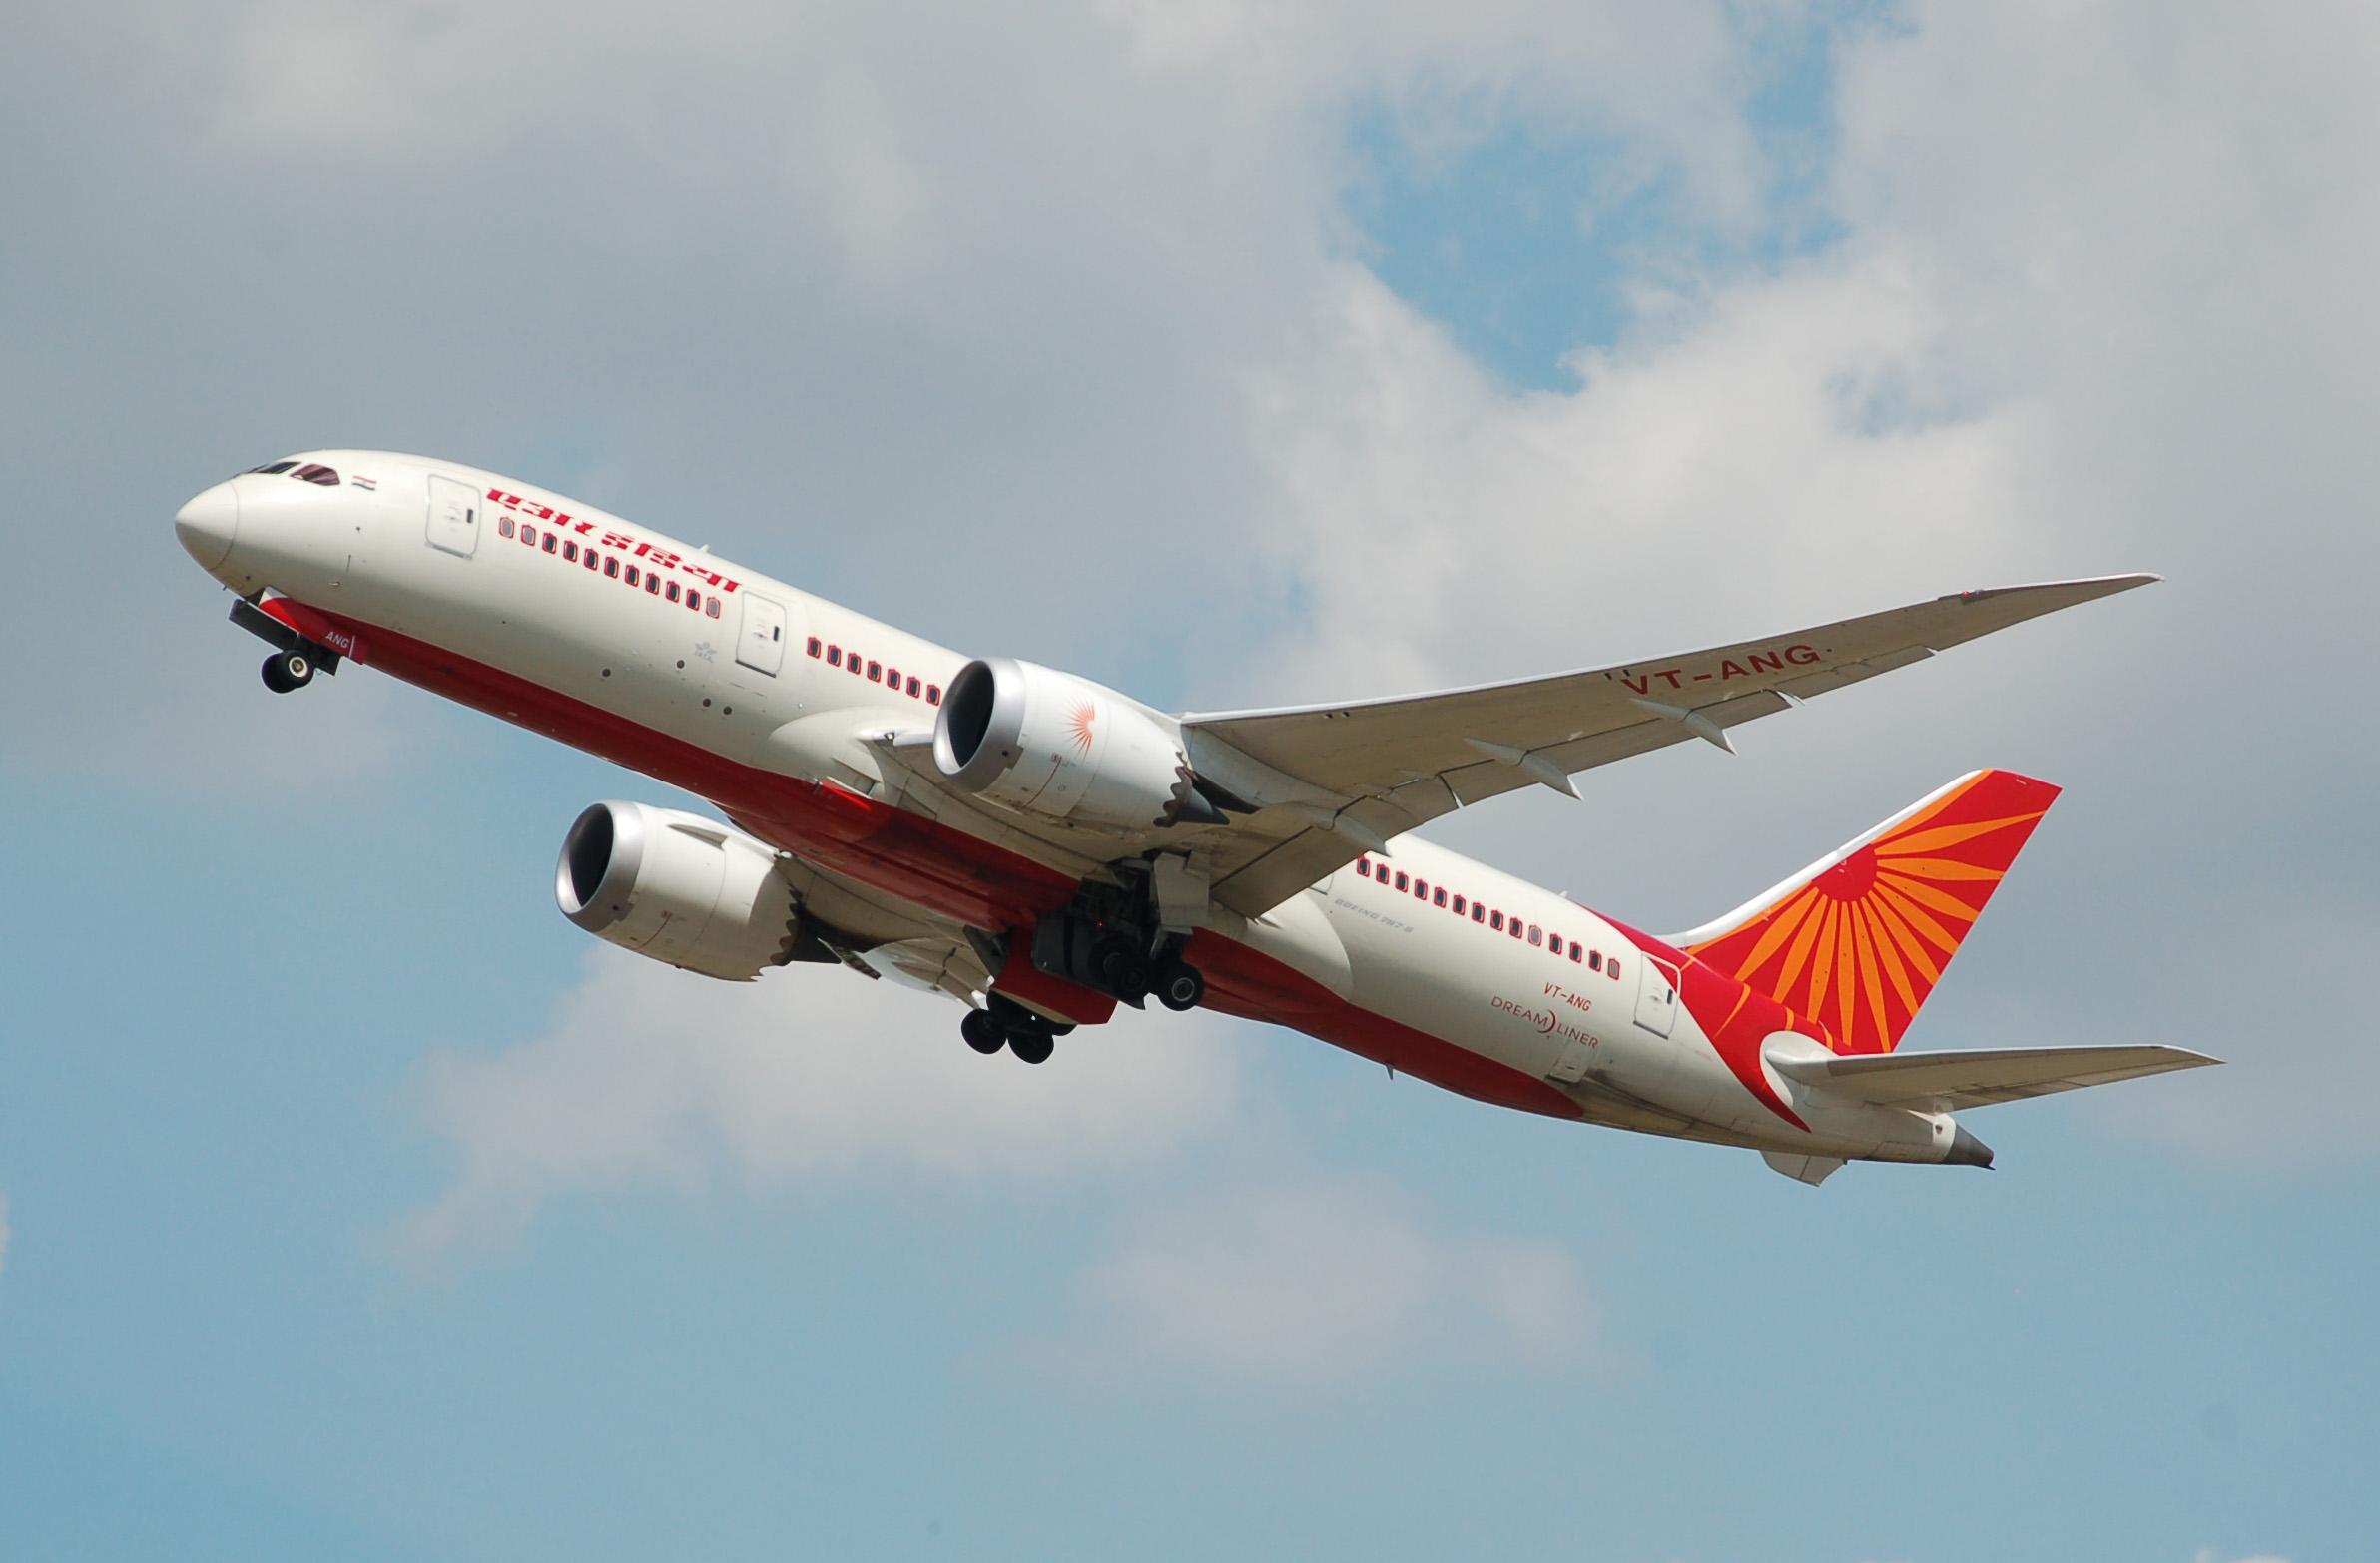 Air India sued in New York in $97.7m haj lawsuit